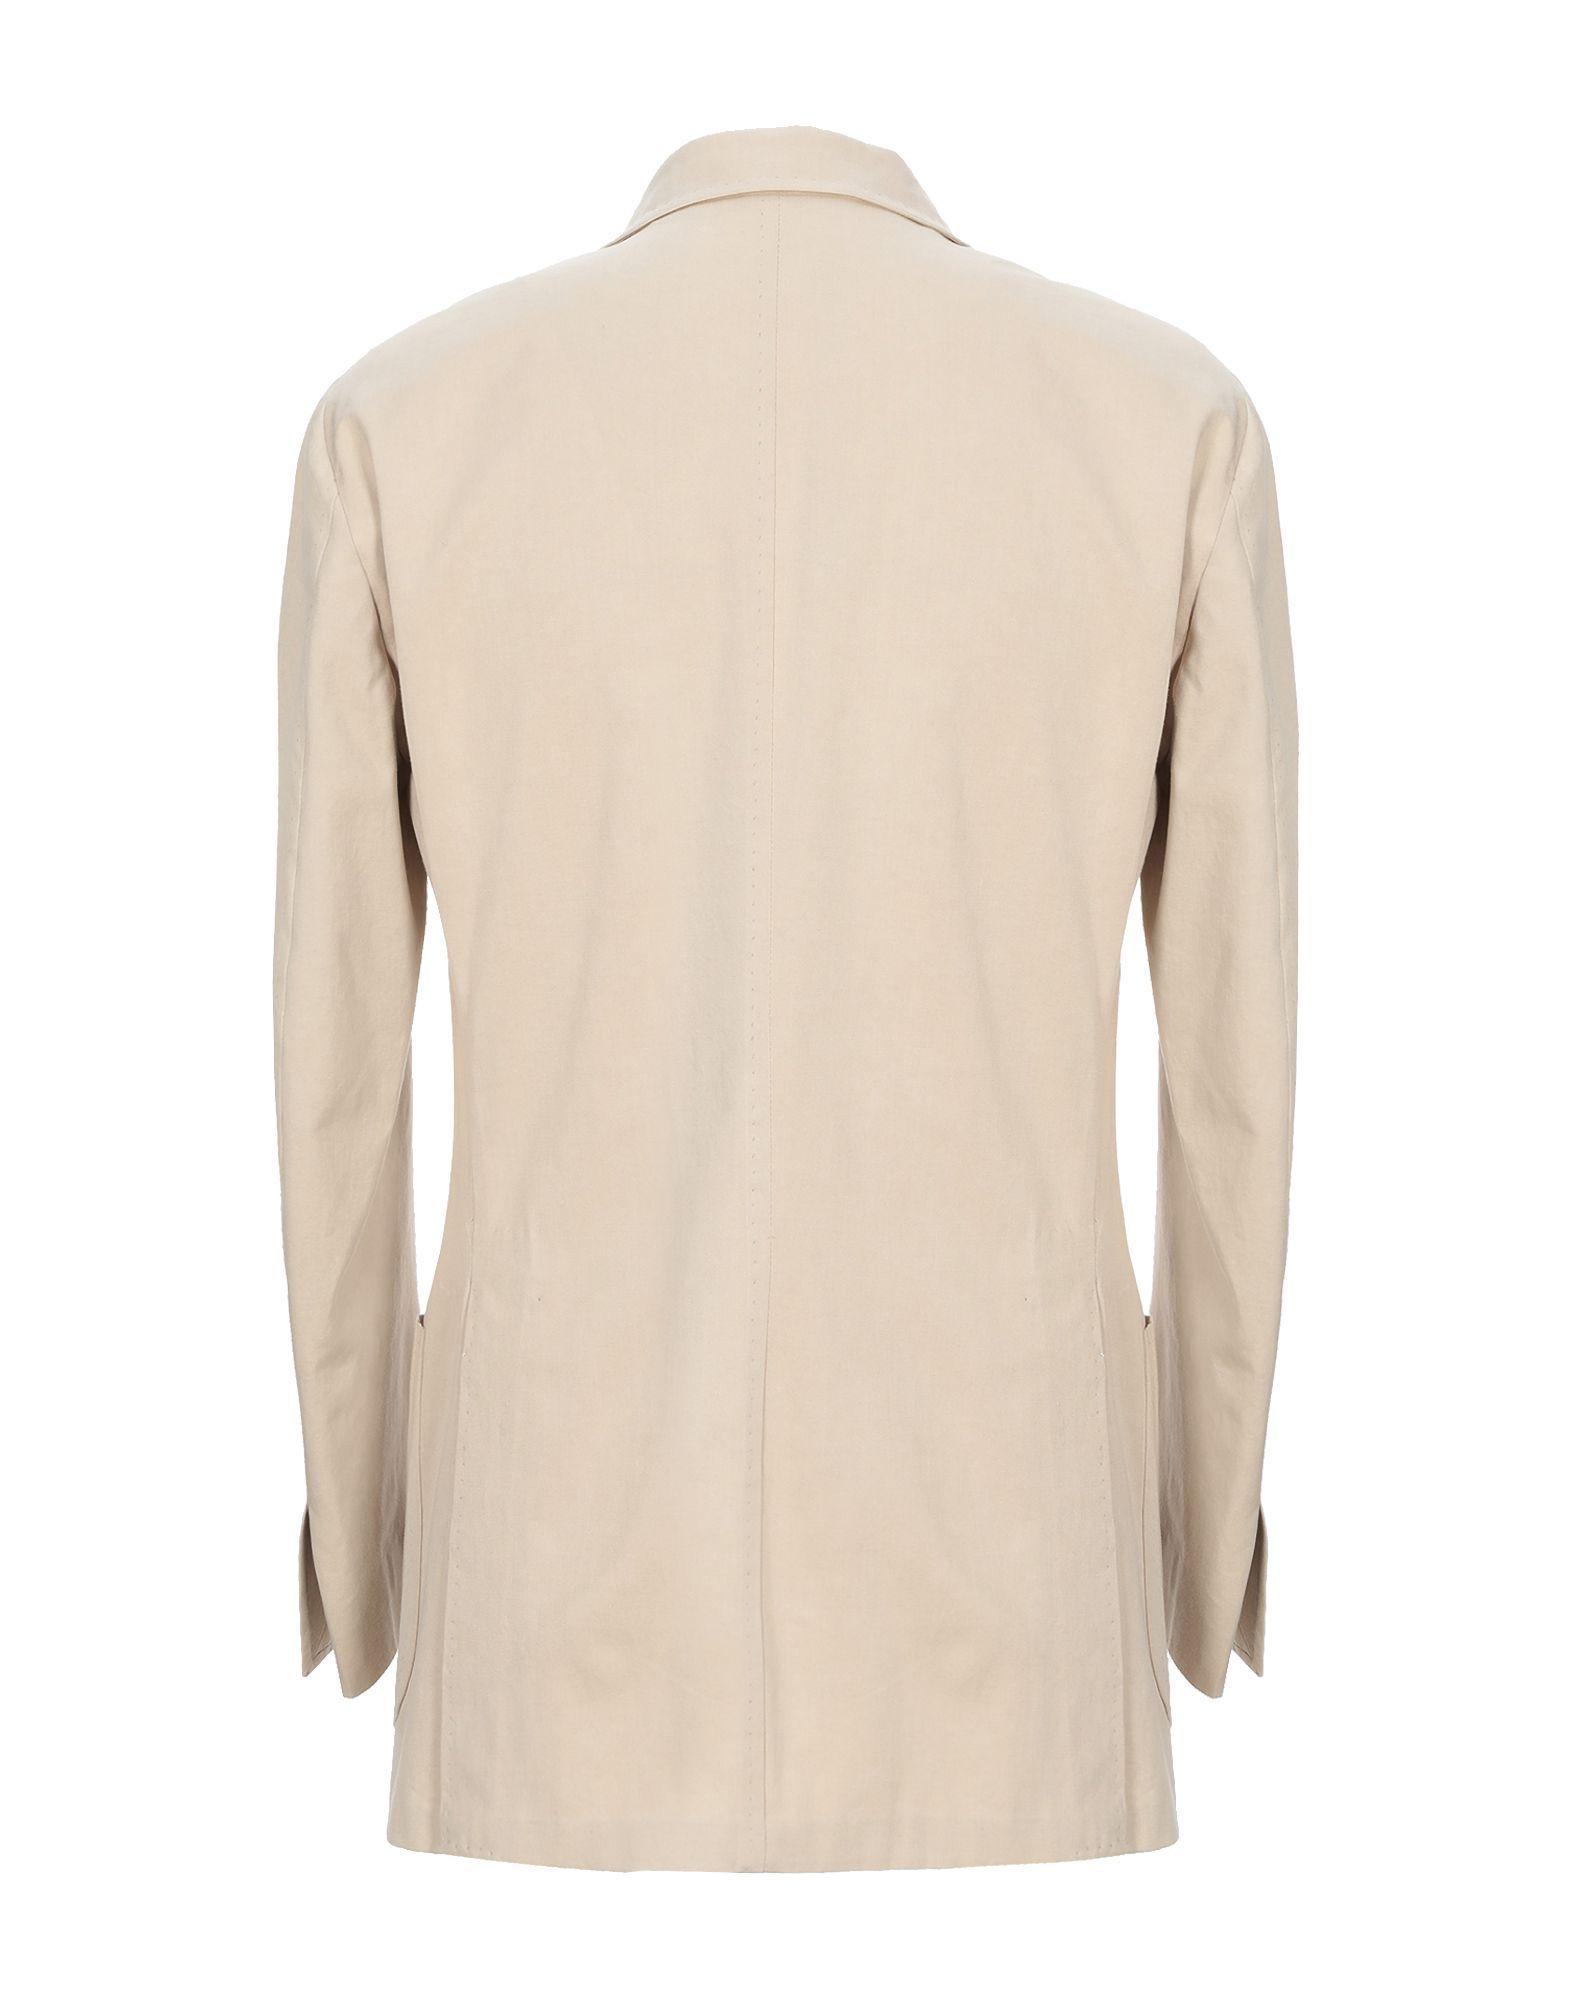 Luigi Borrelli Napoli Beige Cotton Single Breasted Jacket